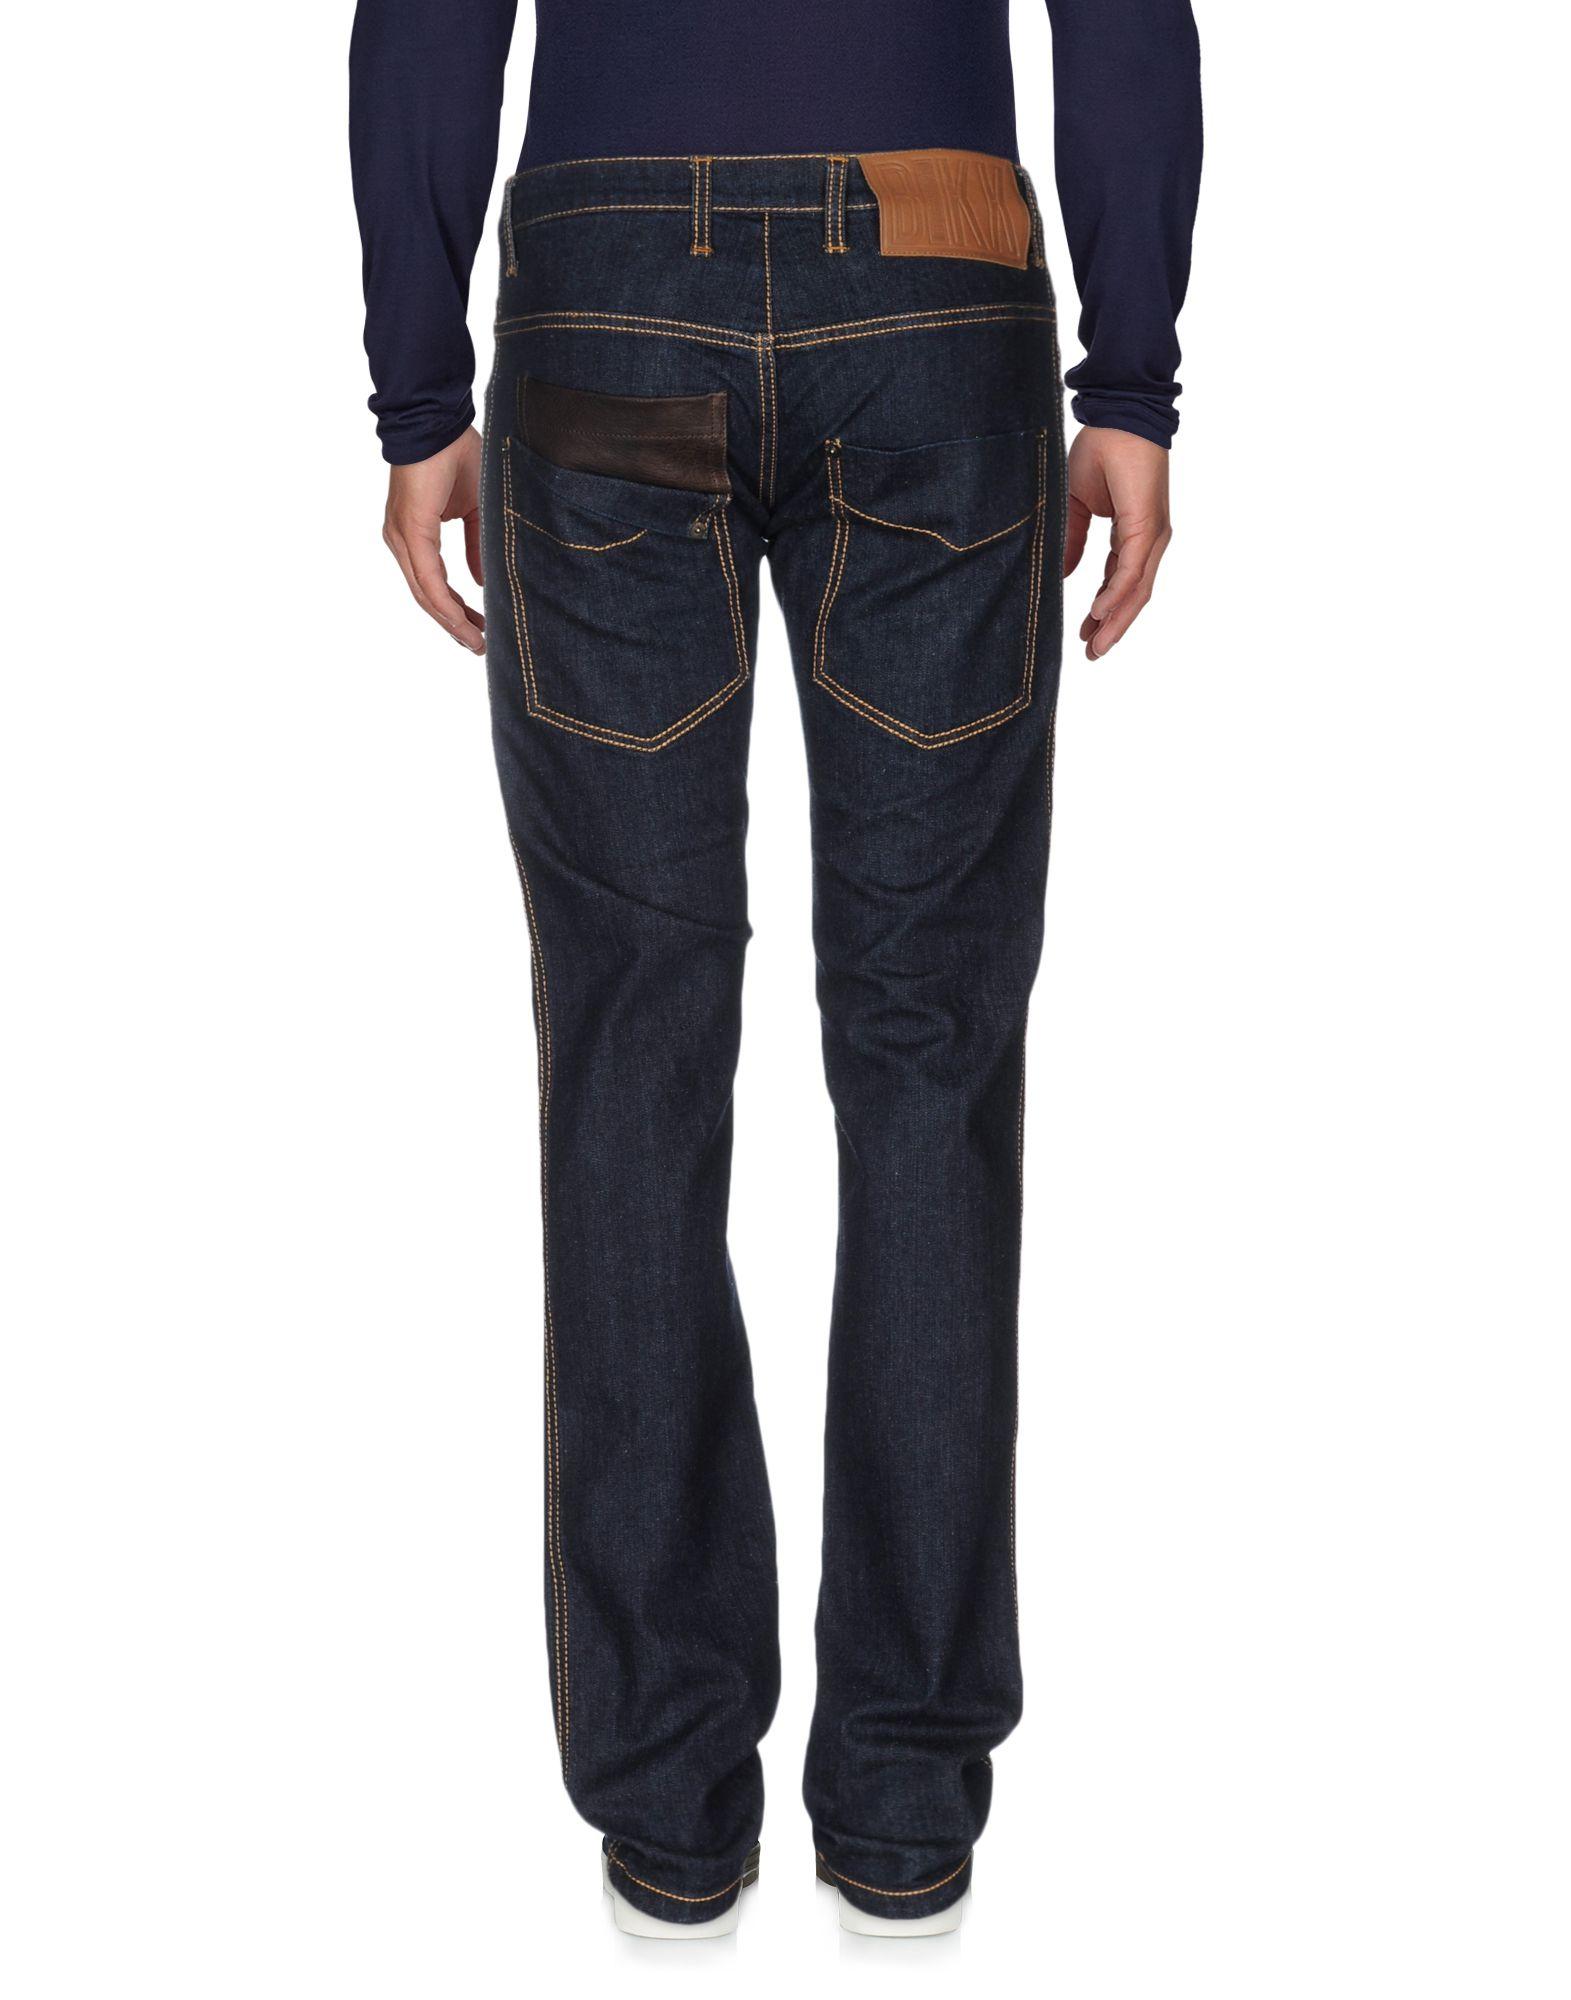 Pantaloni Jeans Bikkembergs Uomo 42509769VN - 42509769VN Uomo d05c3b